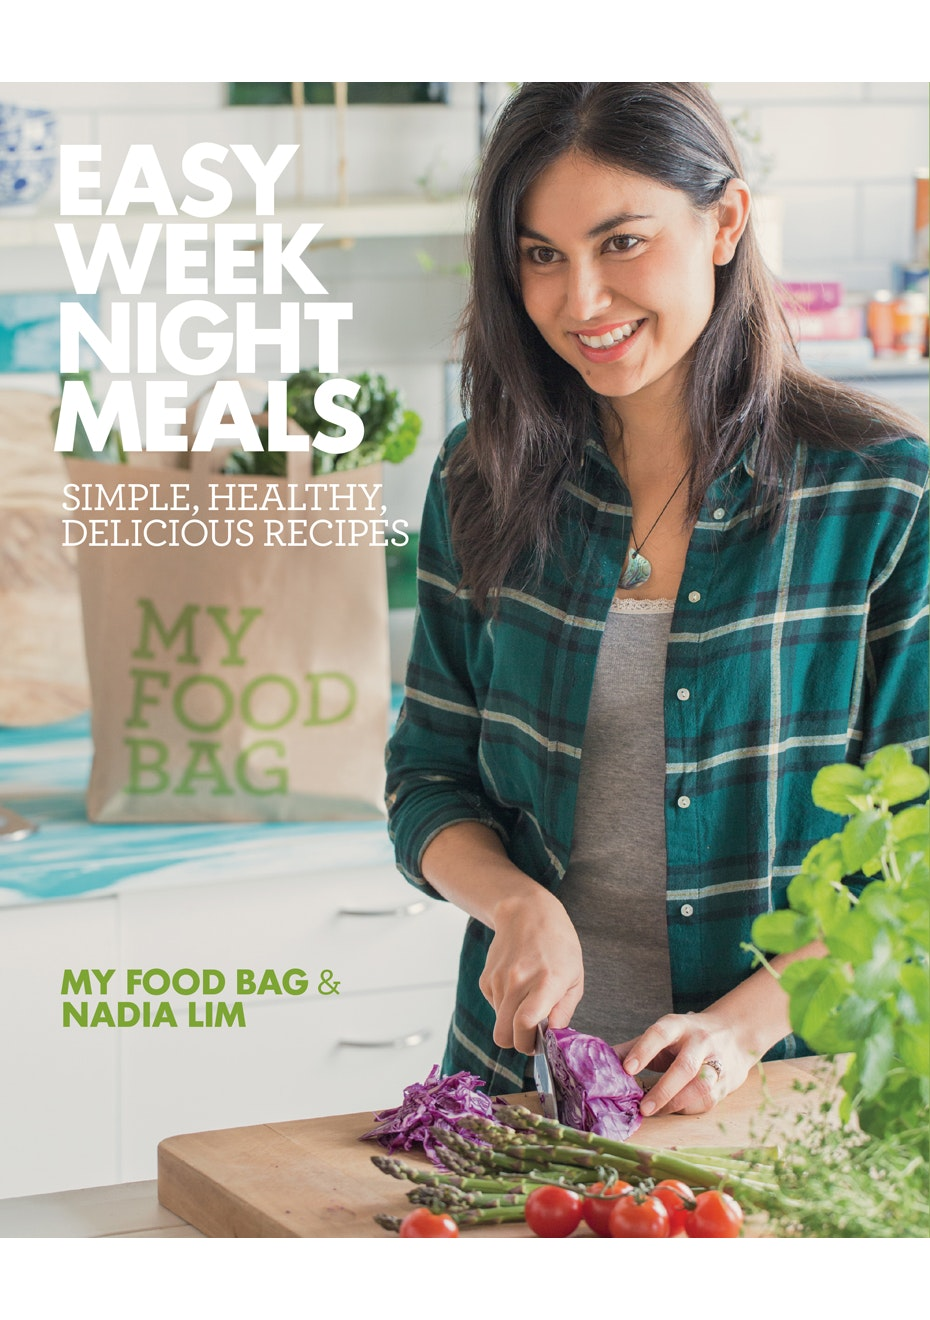 Easy Weeknight Meals, by My Food Bag & Nadia Lim